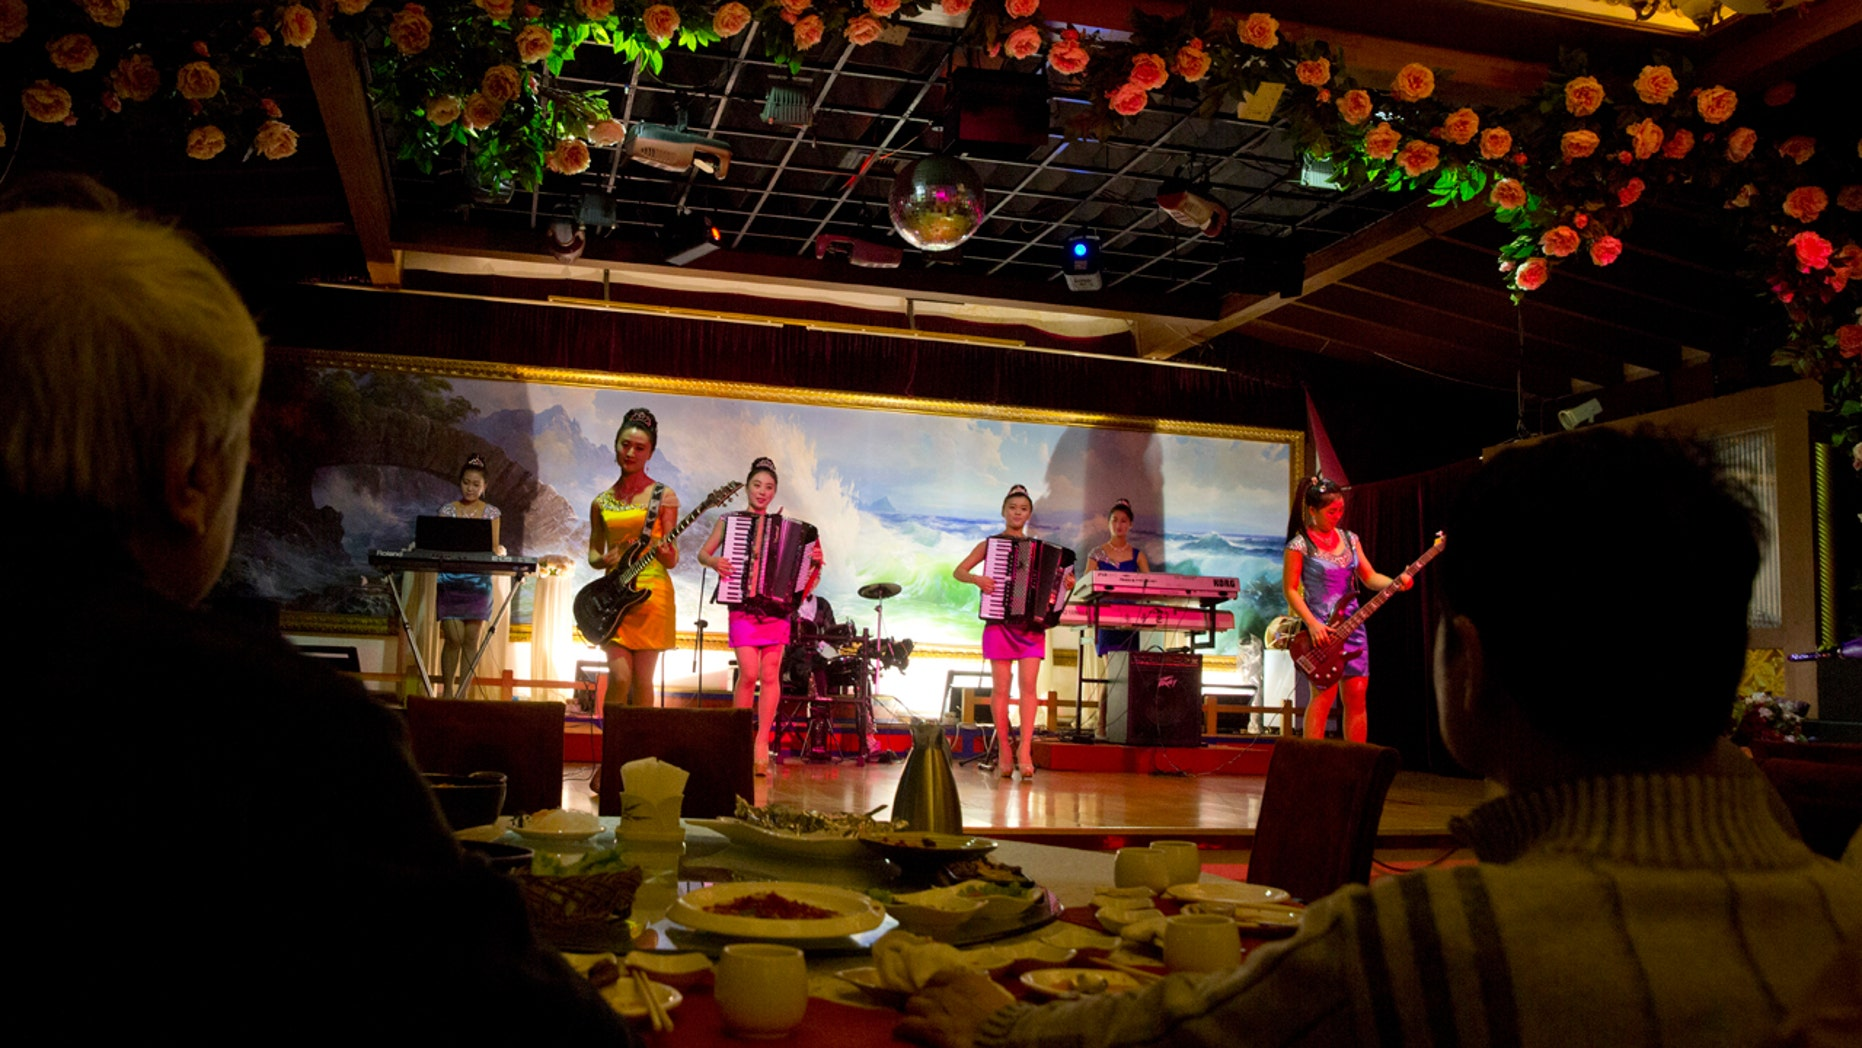 Feb. 18, 2016: North Korean performers entertain customers at the Okryugwan restaurant in Beijing, China.